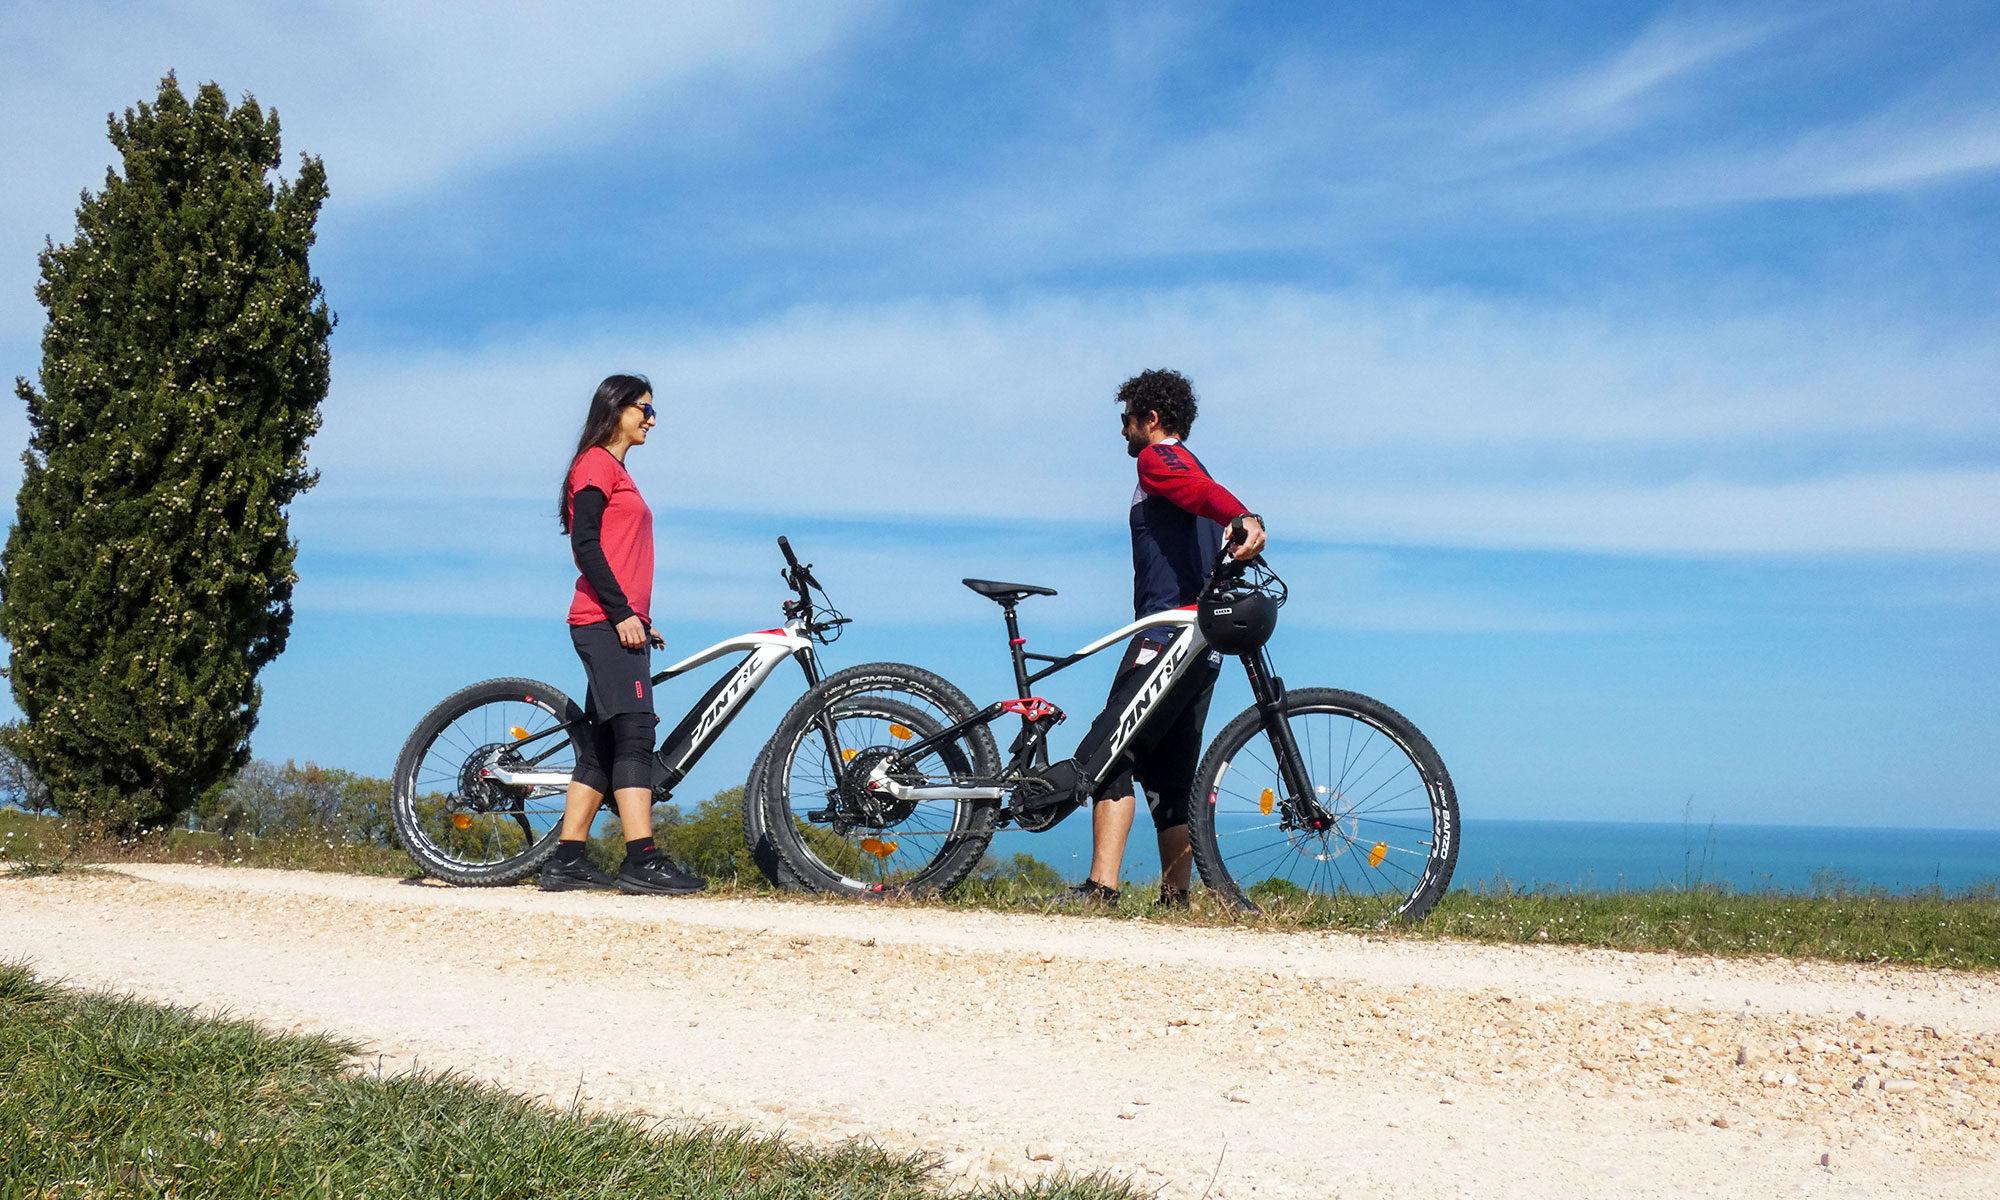 Freeride Civitanova Kiteschool e-bike rental